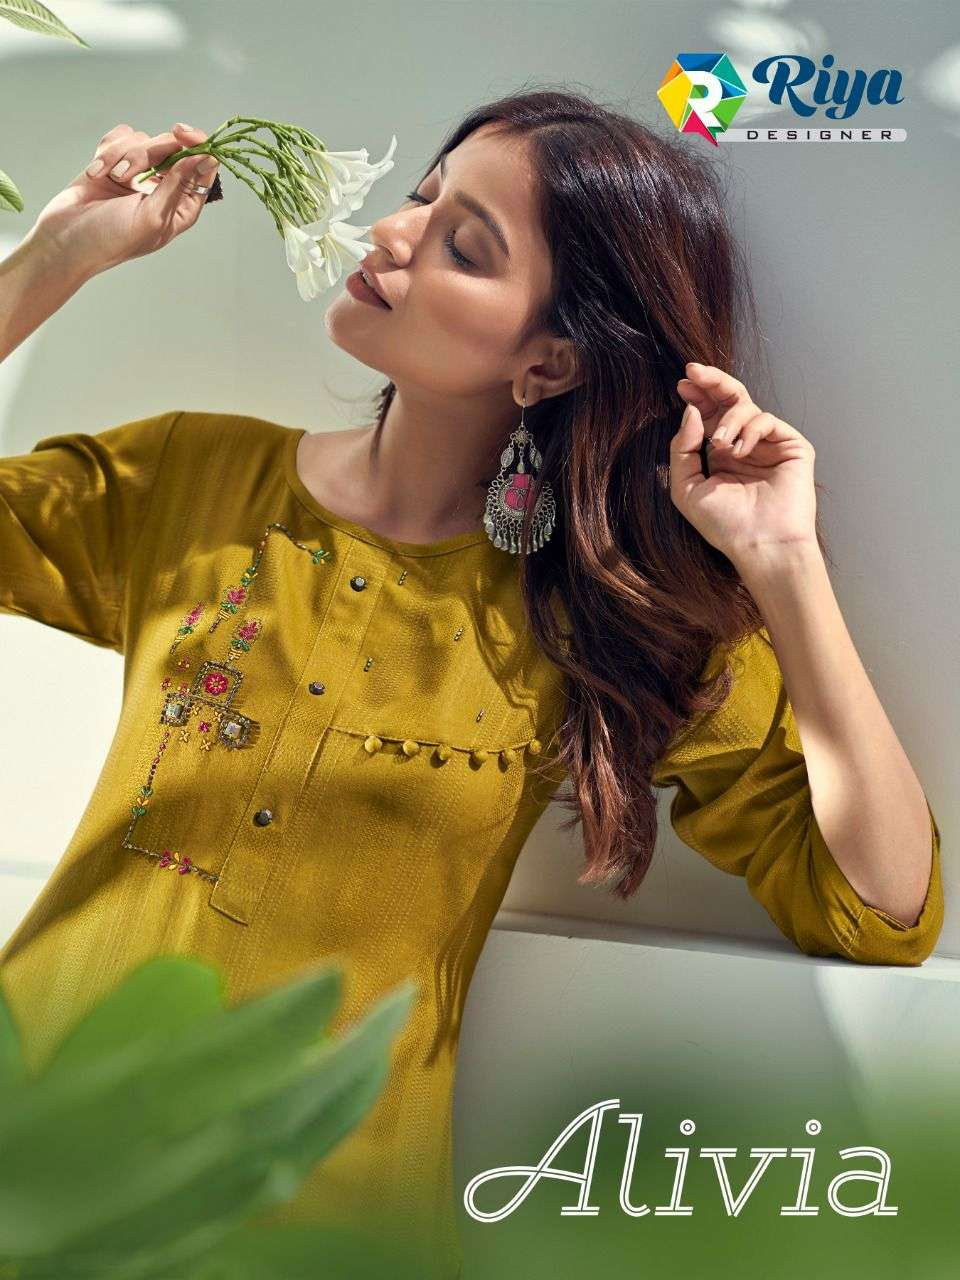 Riya Designer Alivia Fancy Rayon Kurti Catalog Buy Online